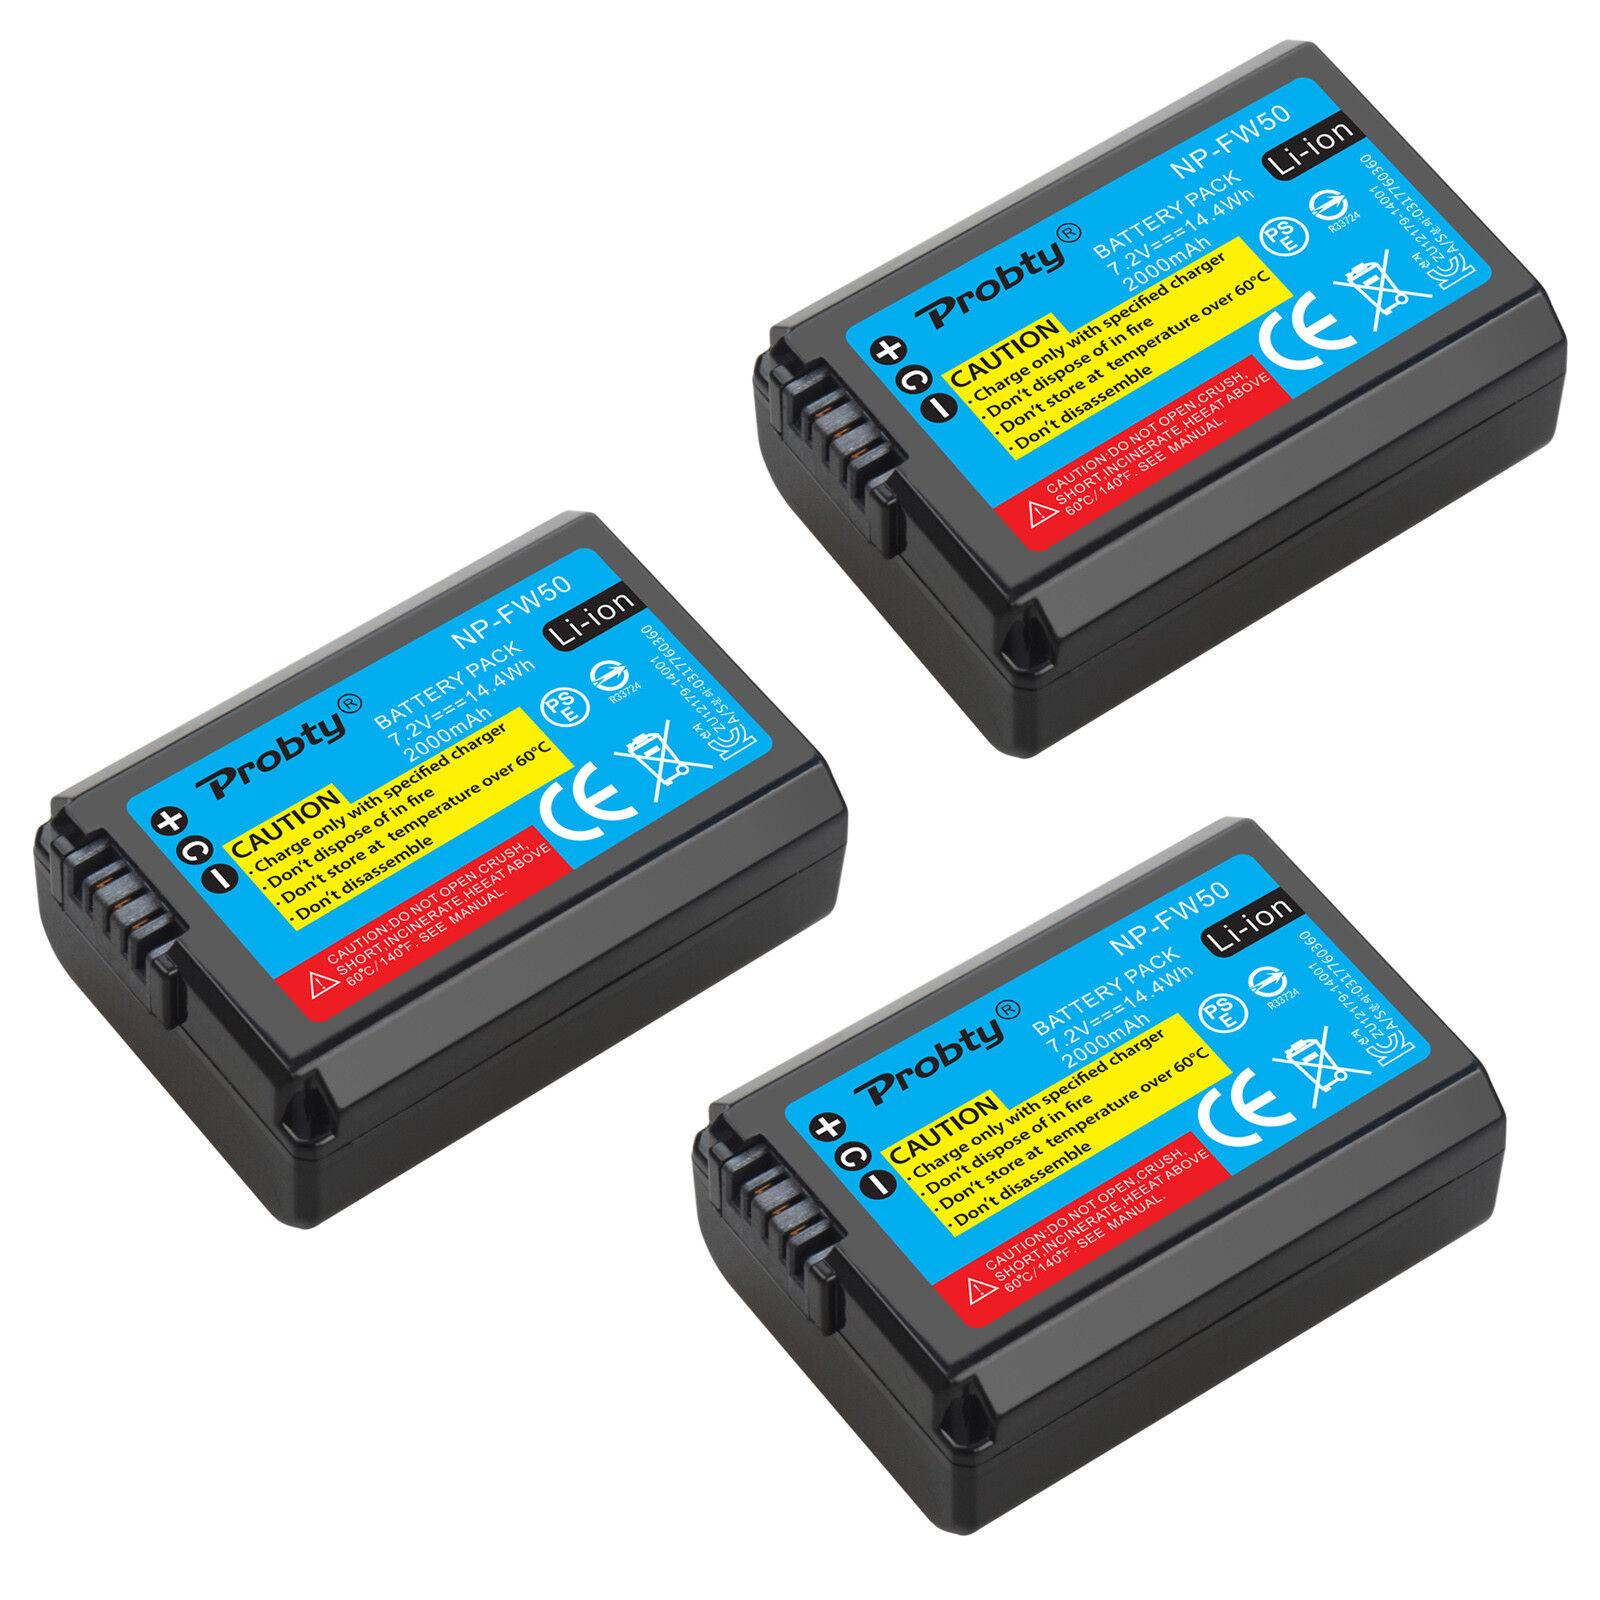 3 Batteries